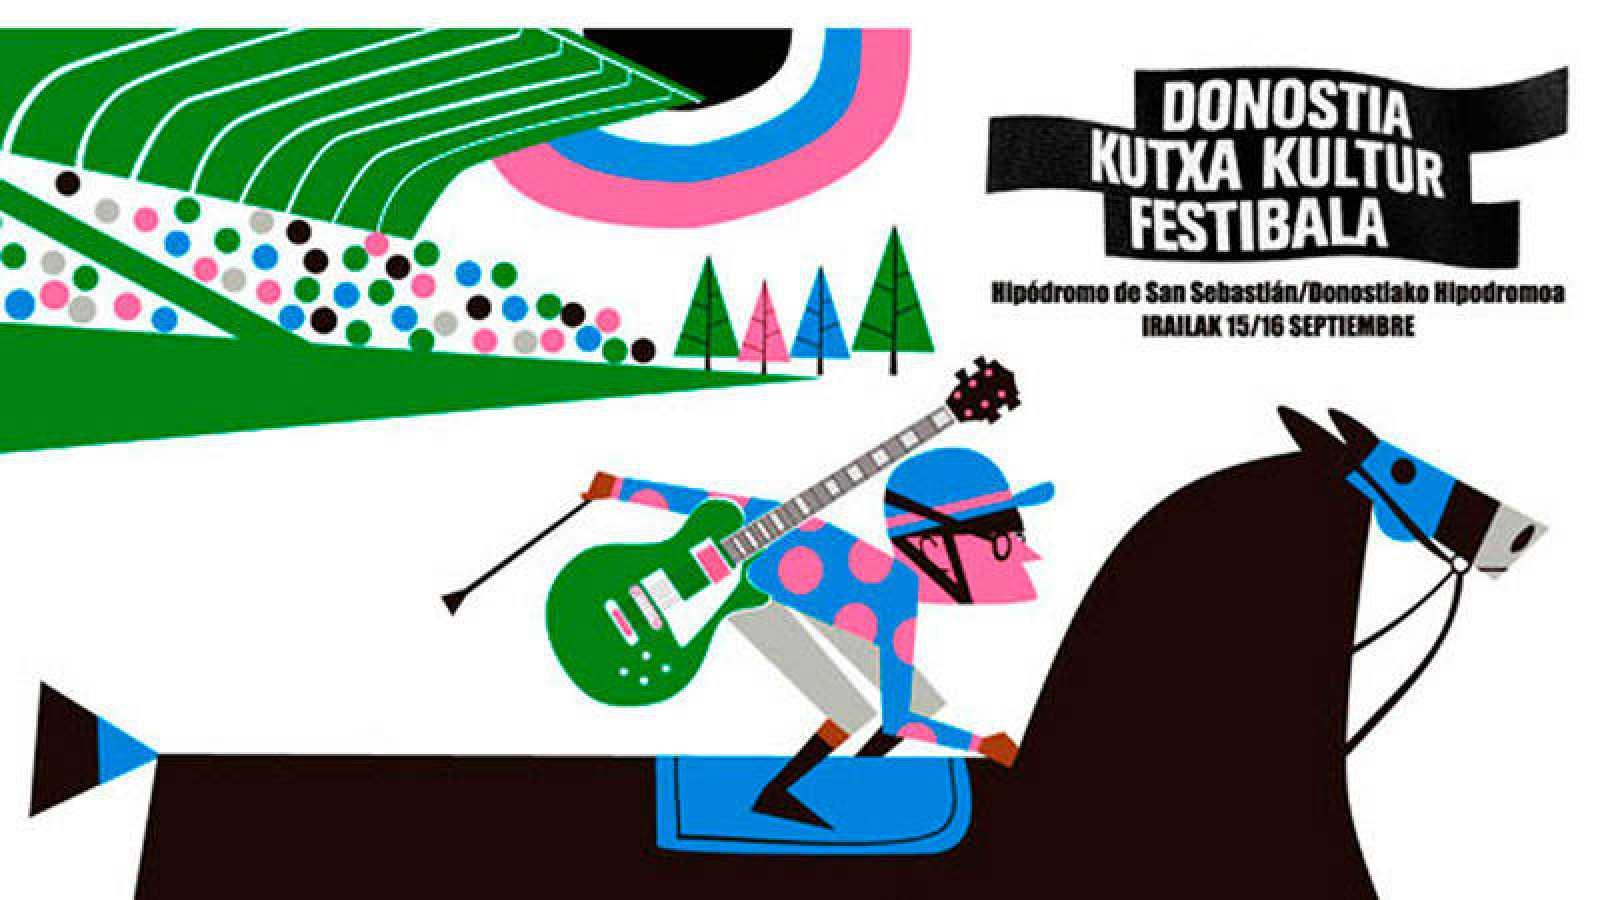 Donostia Kutxa Kultur Festibala 2017